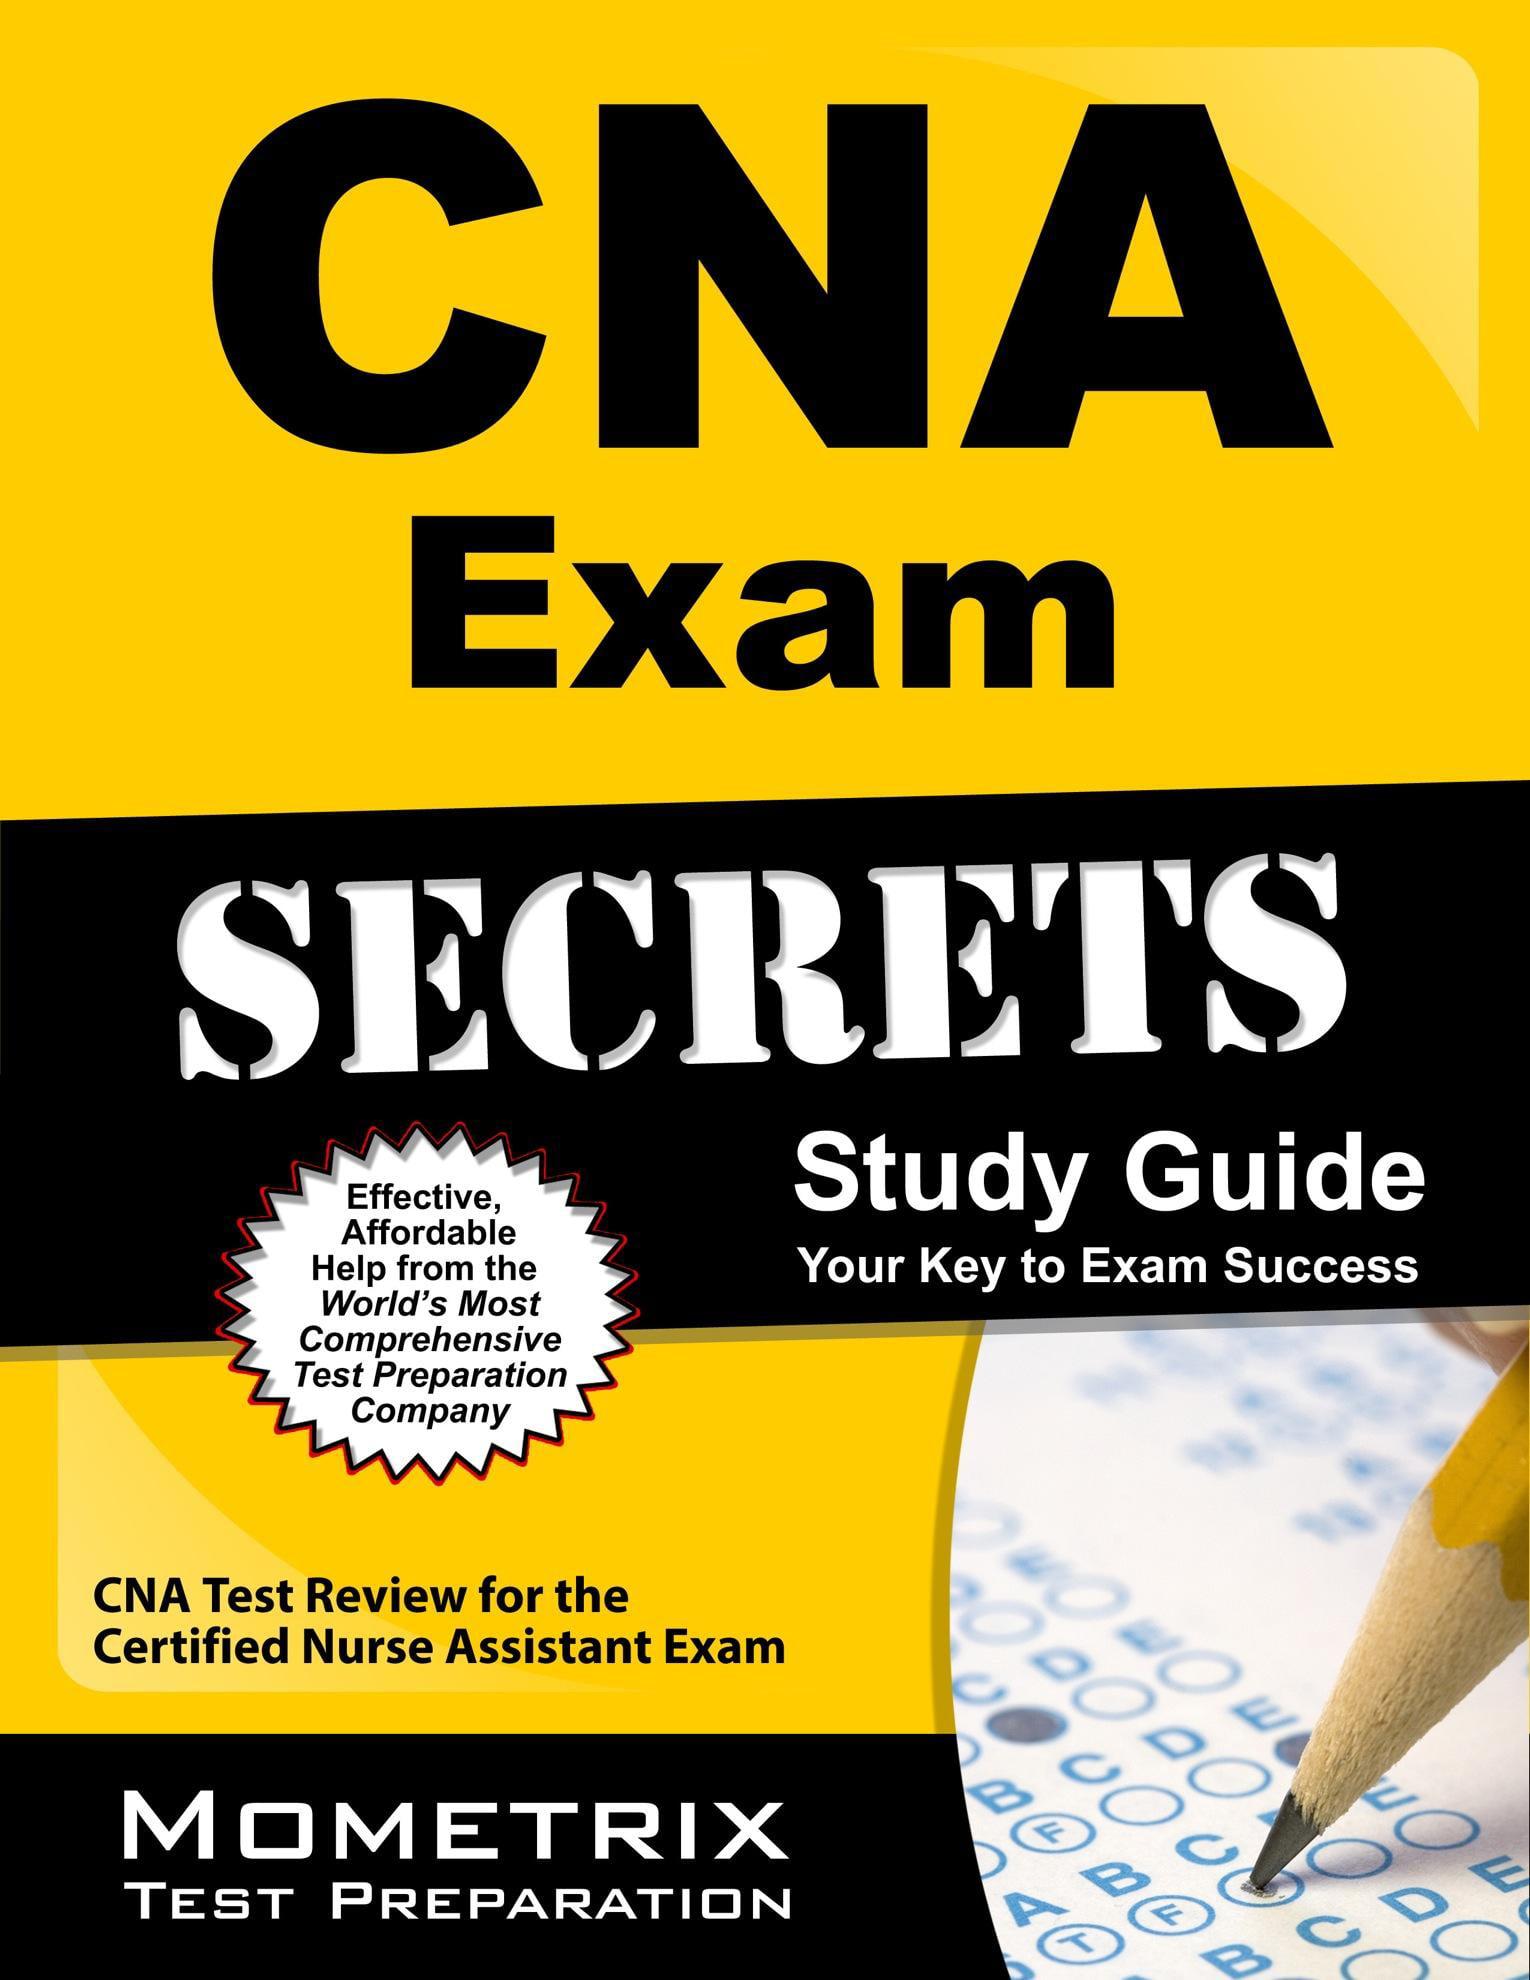 Cna Exam Secrets Study Guide Cna Test Review For The Certified